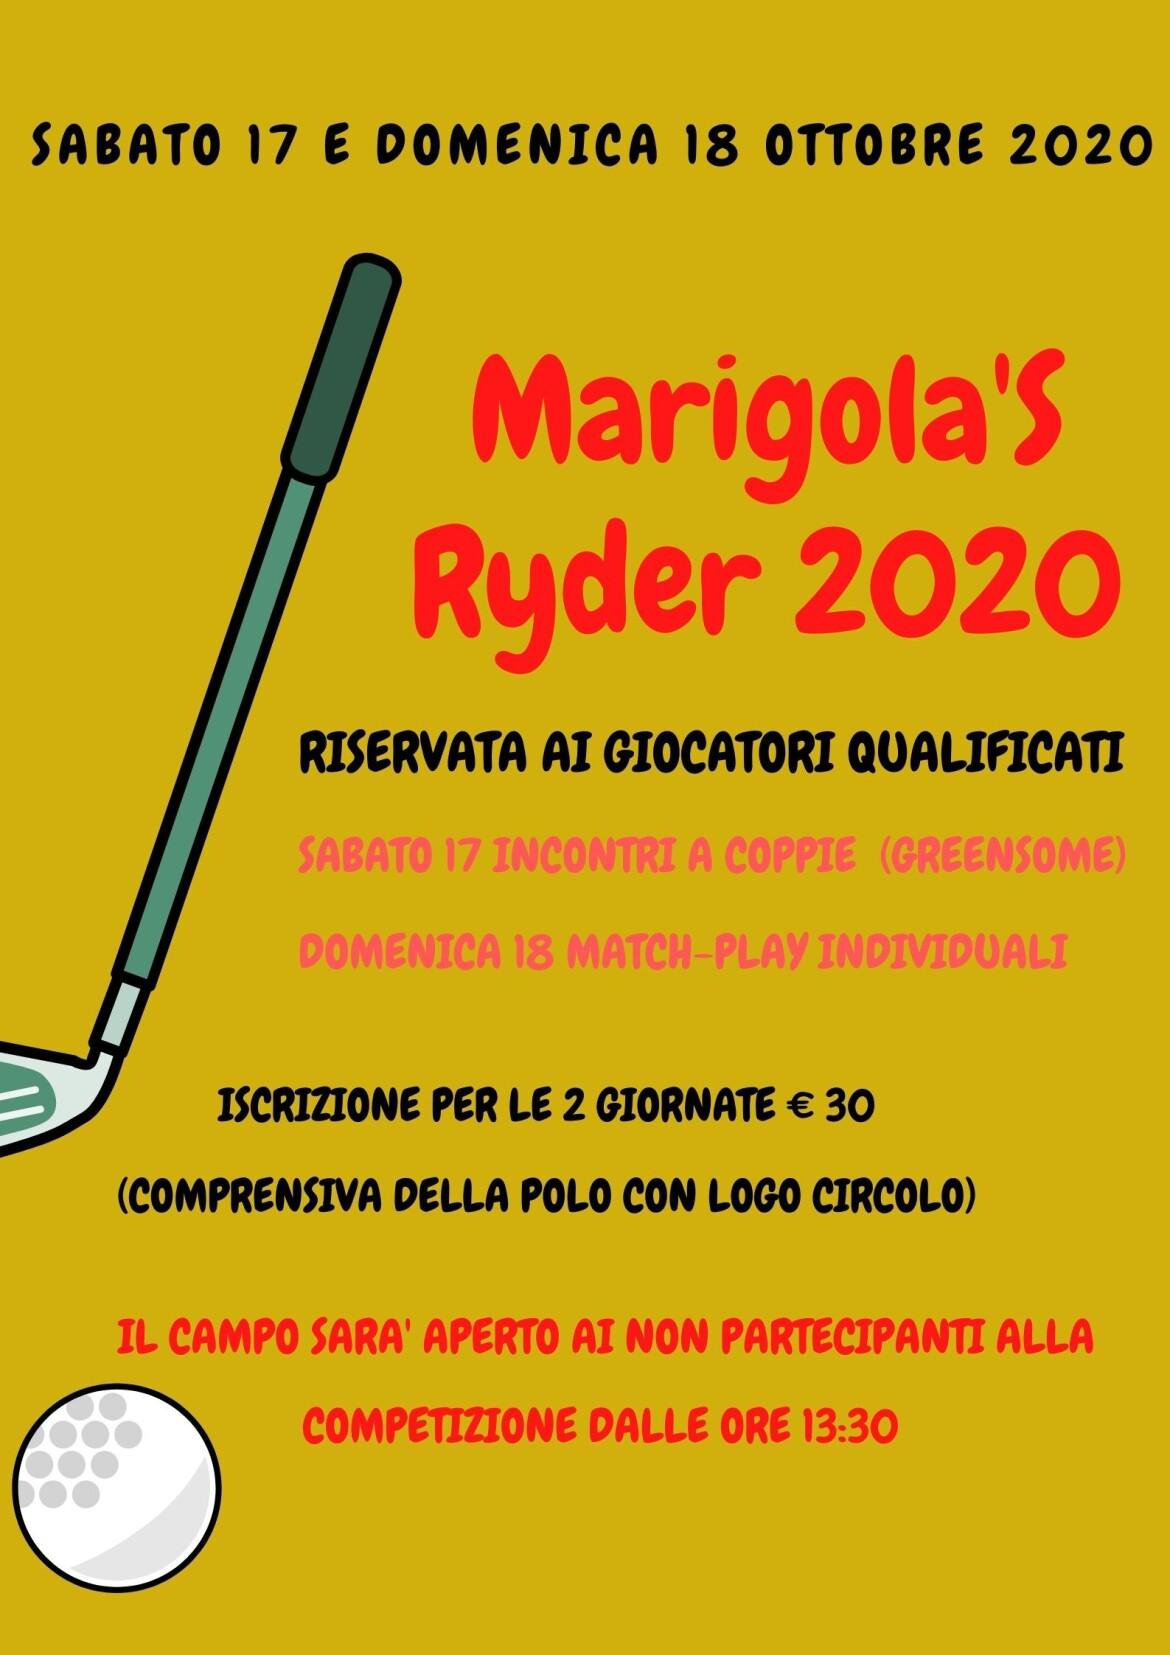 Marigola's Ryder 2020